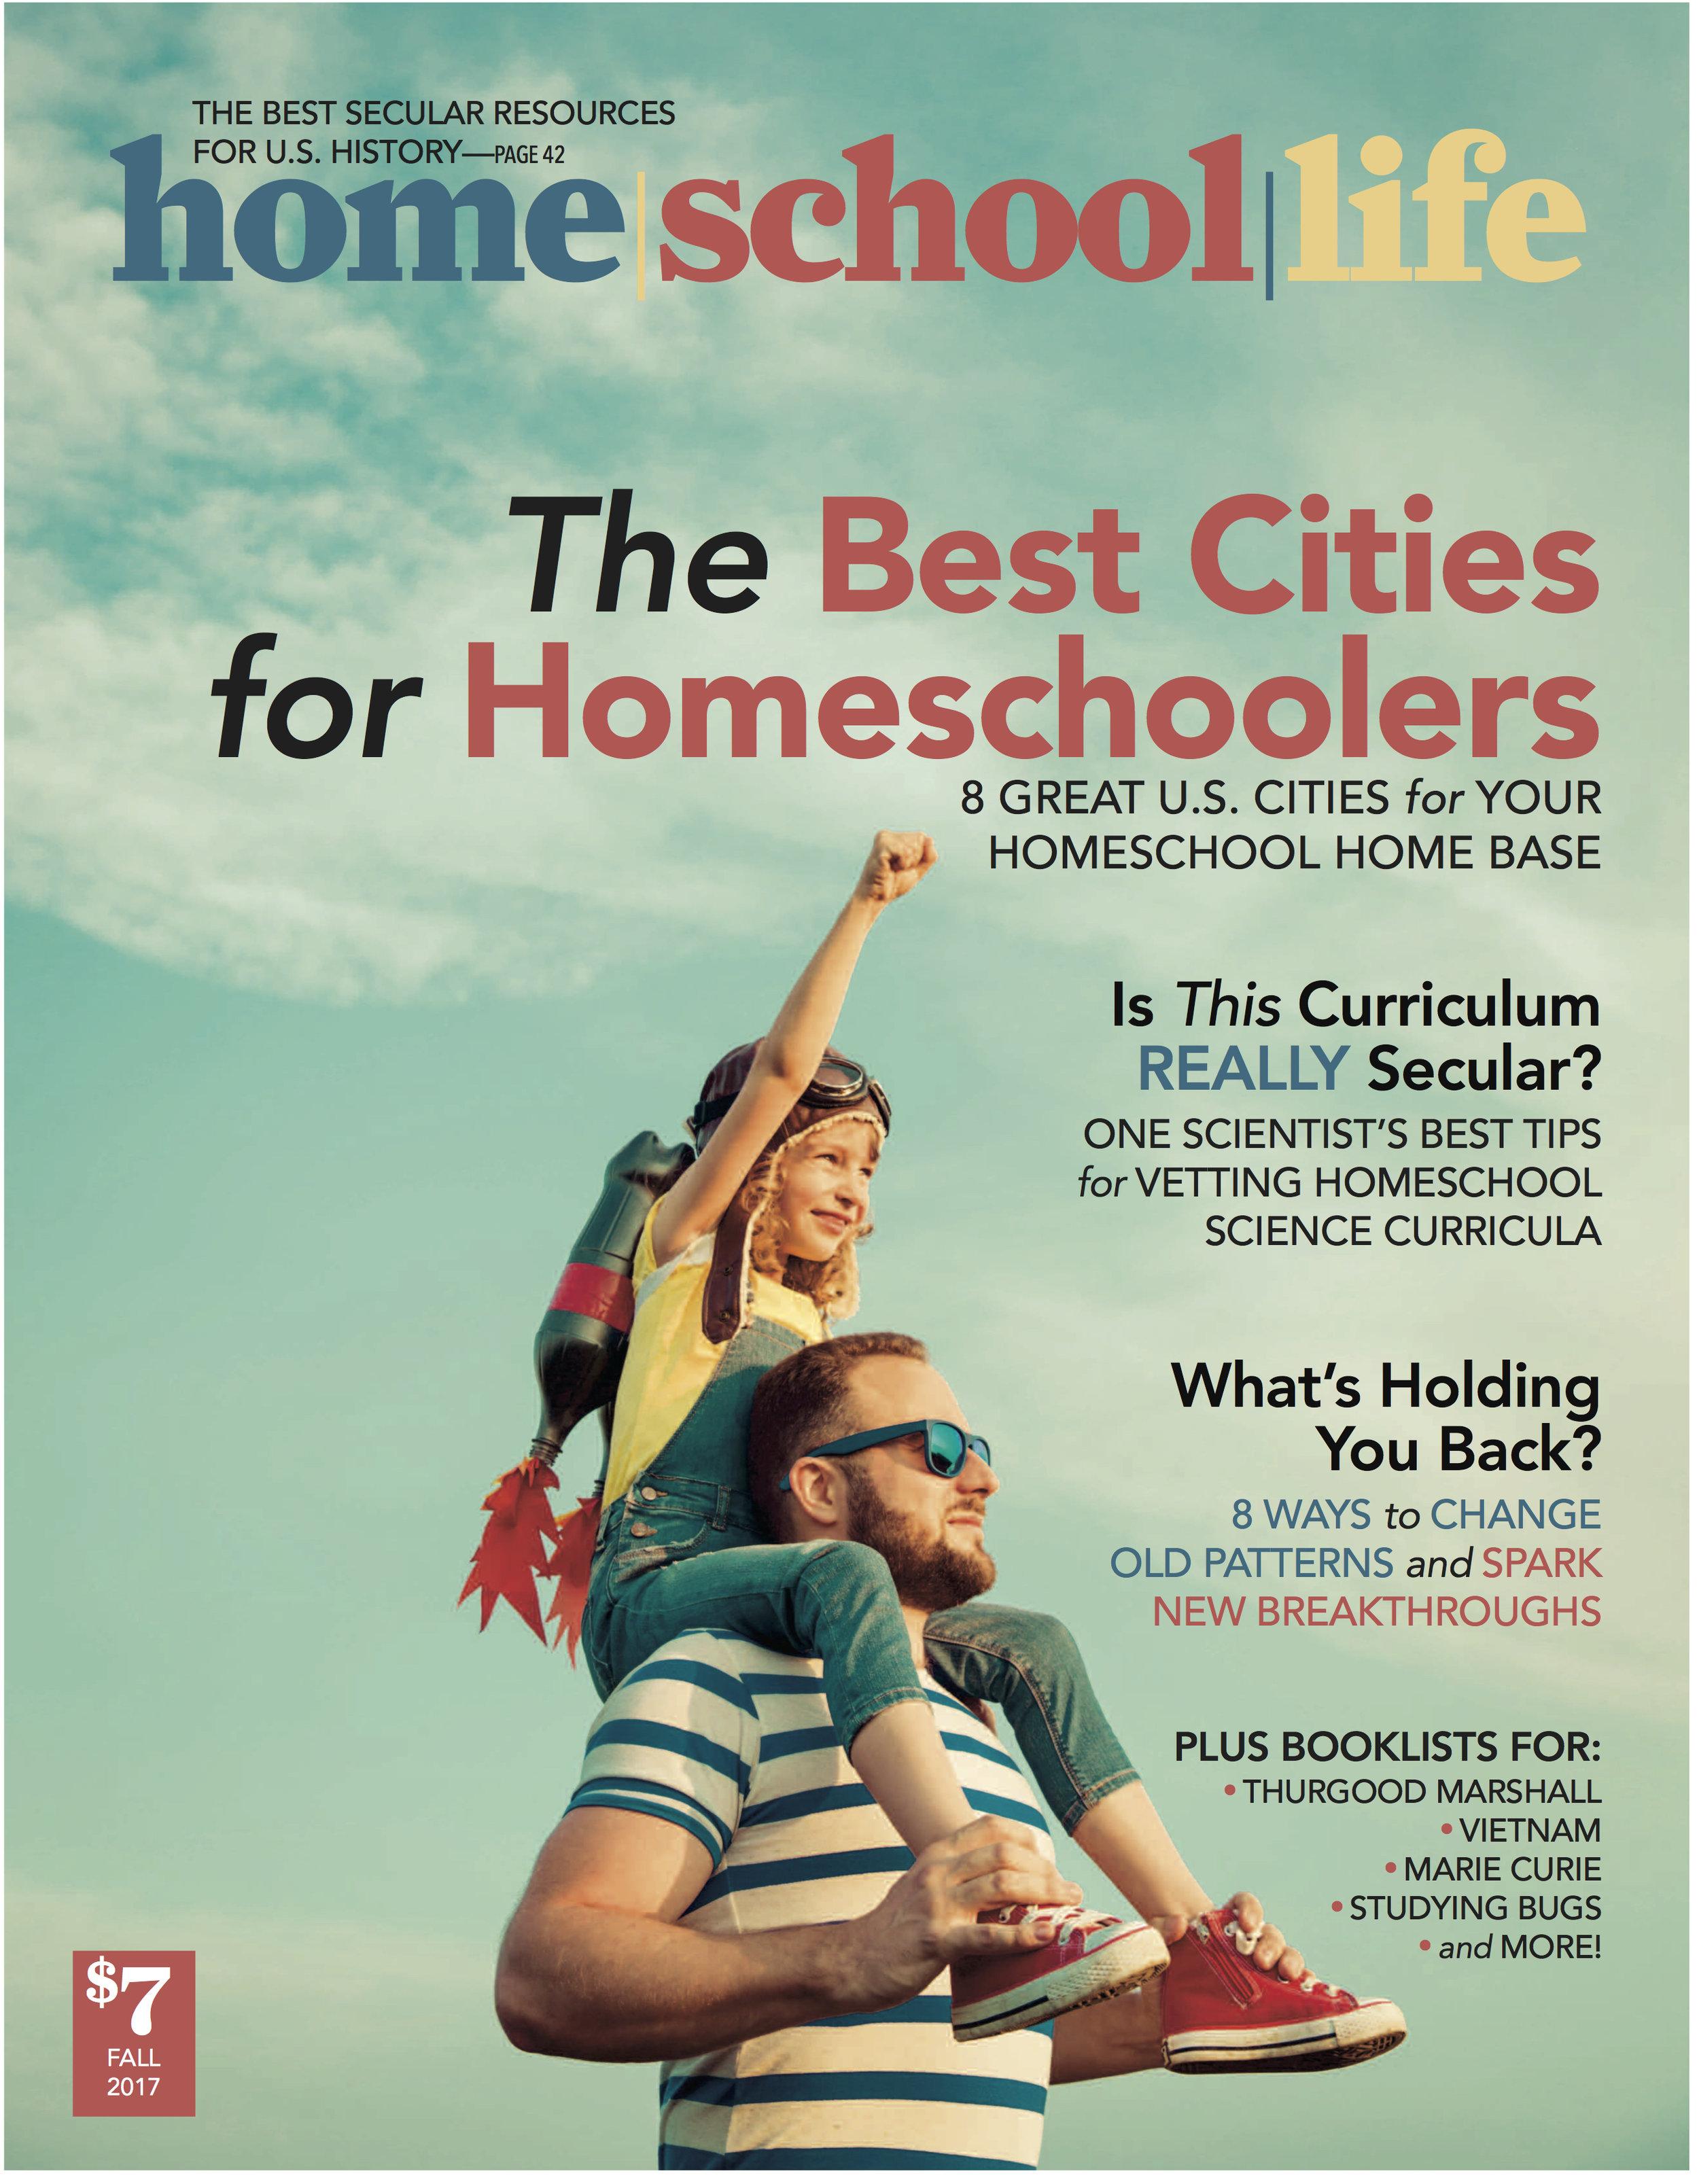 home/school/life is a secular homeschool magazine